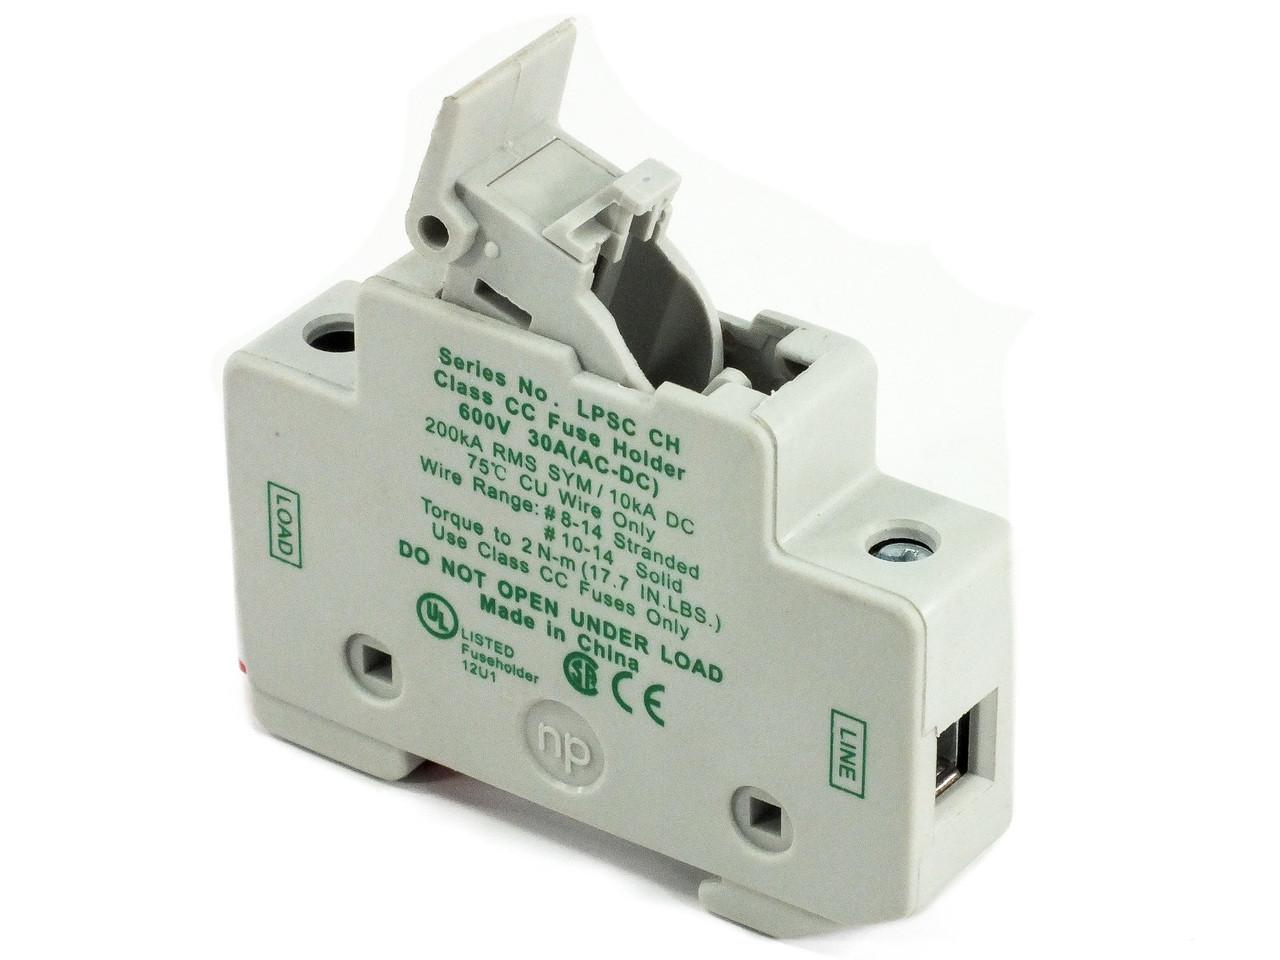 Littelfuse Class Cc Fuse Block Data Wiring Diagrams Littlefuse Box Holder Lpsh Ch Powr Safe 600v 30a Rh Recycledgoods Com Logo